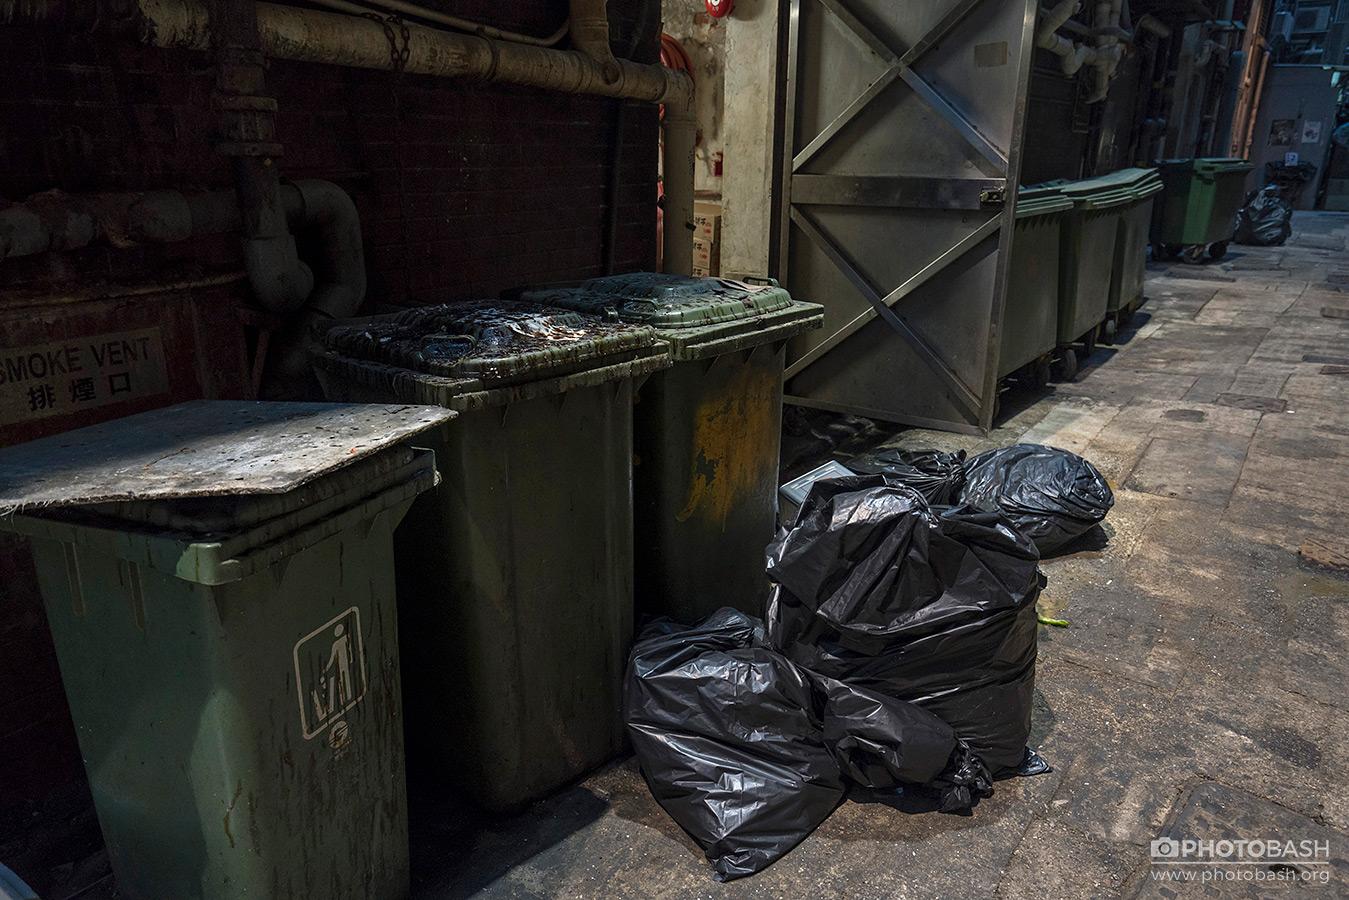 Dirty-Alley-Kowloon-Garbage-Trash.jpg